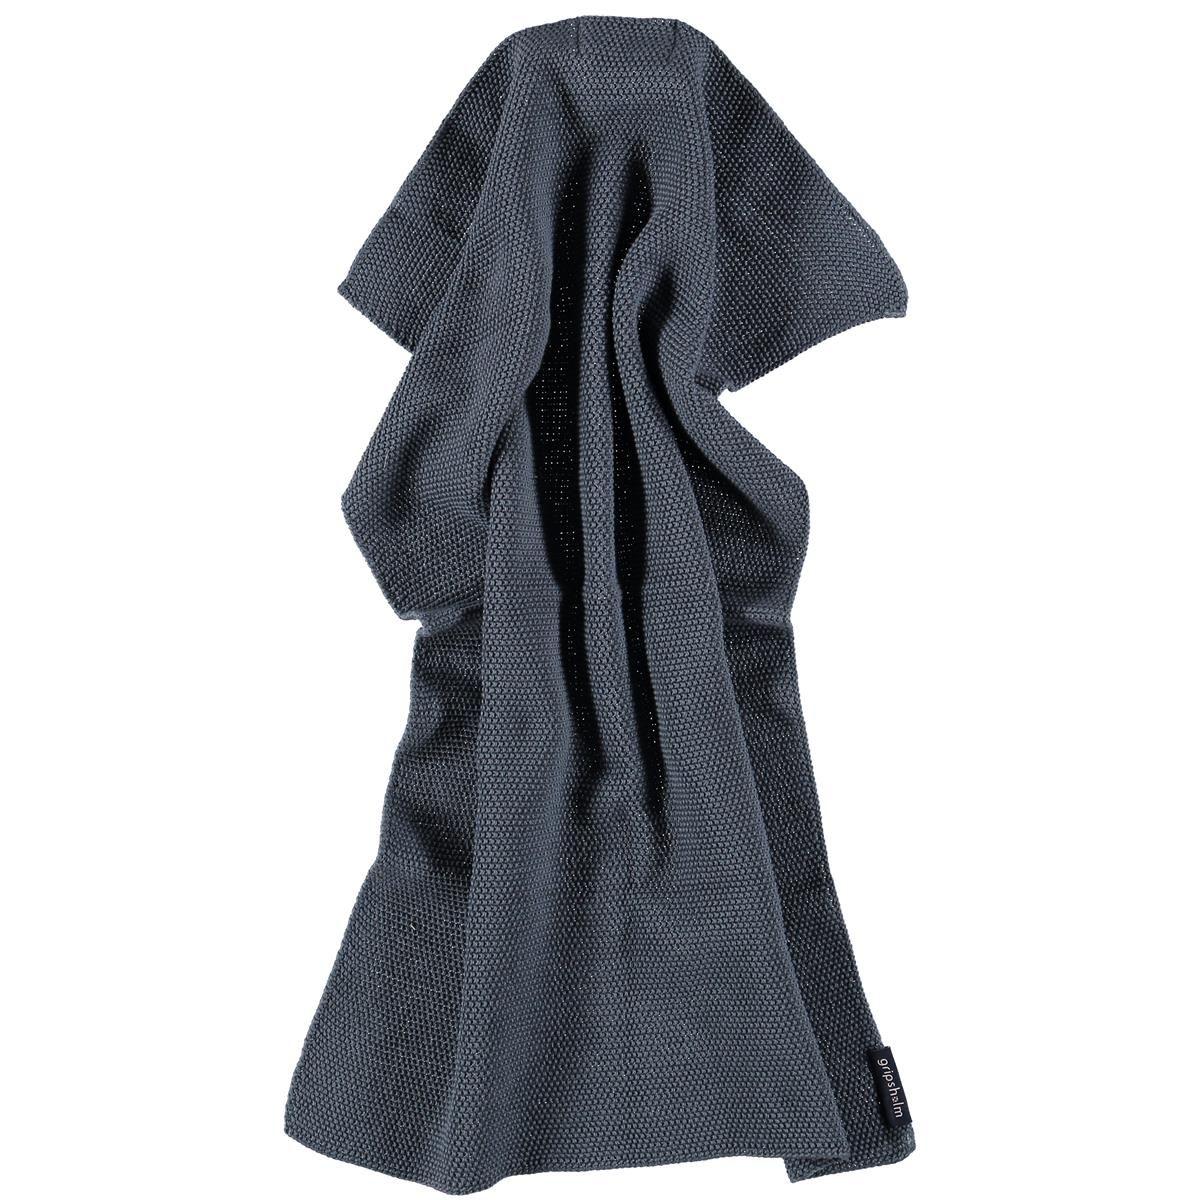 Gripsholm Knitted Keittiöpyyhe, 40x60cm, Ombre Sininen